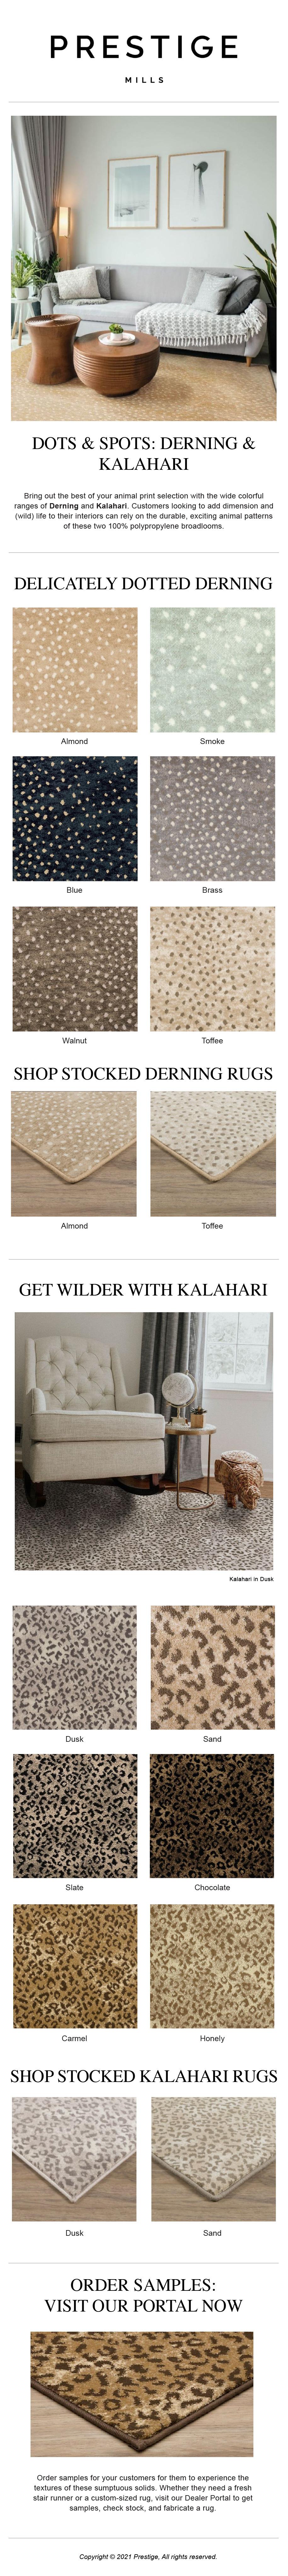 Mailchimp logo Prestige Mills | Spots & Dots: Derning & Kalahari Animal Prints-